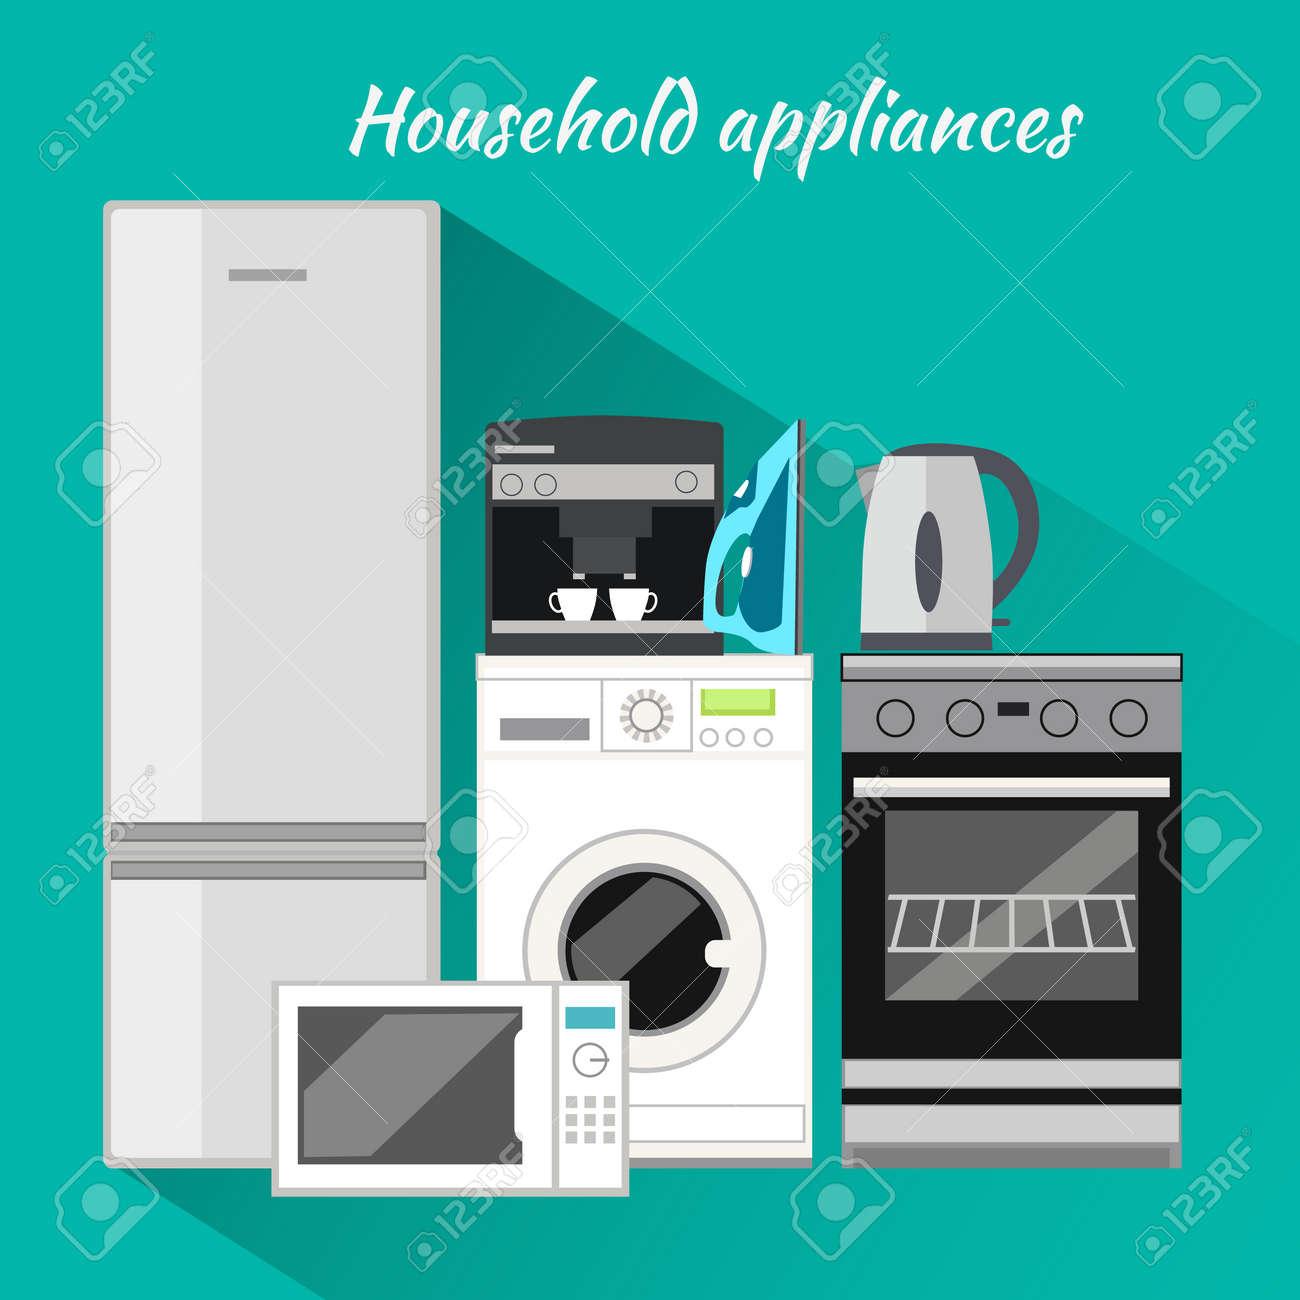 Domestic Kitchen Appliances Household Appliances Flat Design Household Items Washing Machine